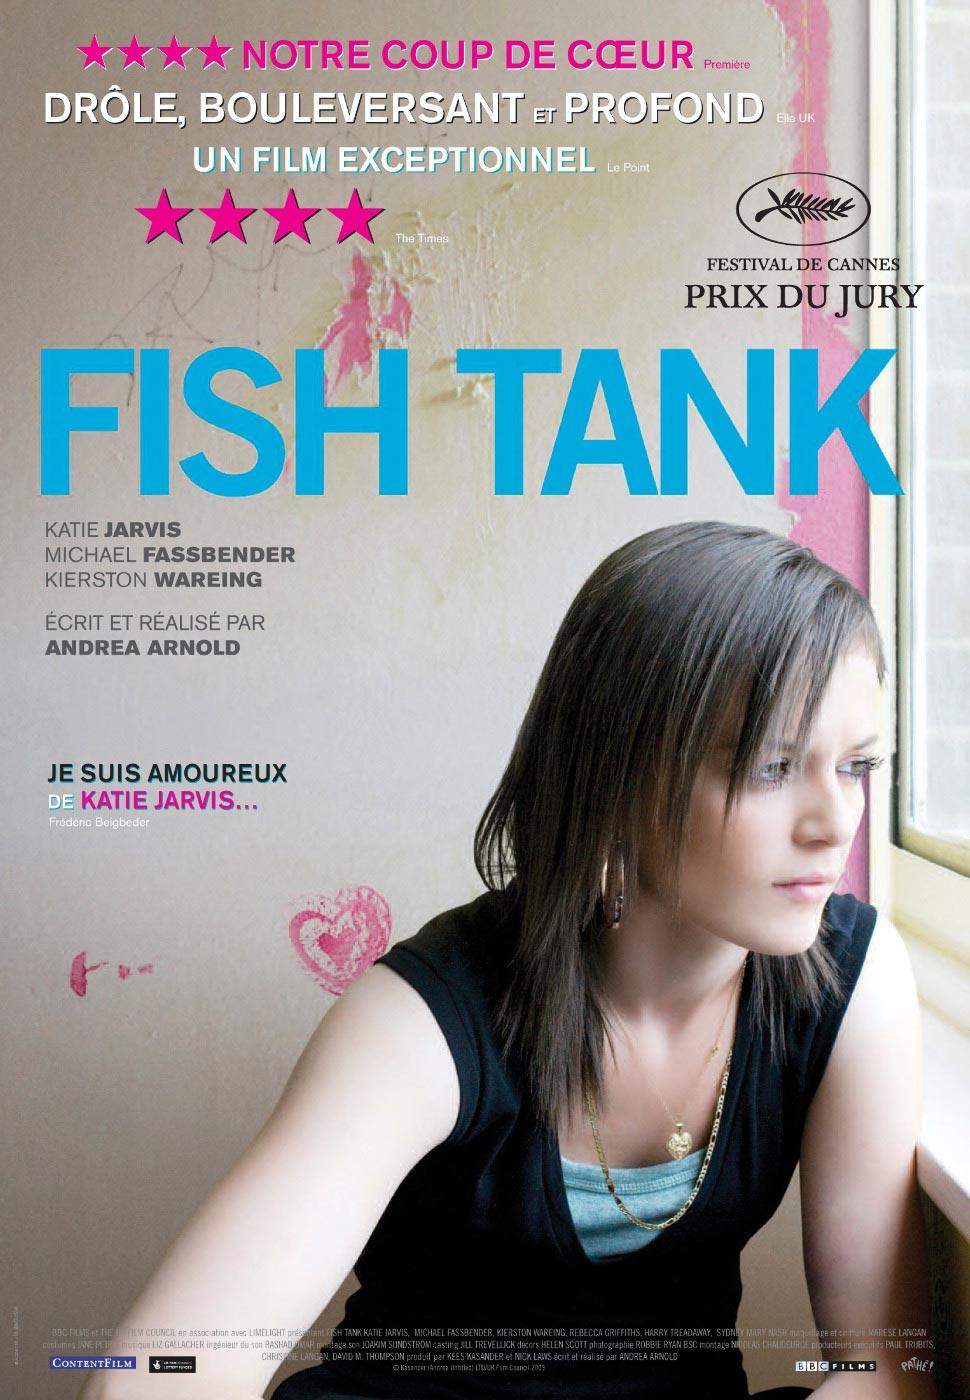 http://2.bp.blogspot.com/_VQBwLRjMRgE/SpL0cwjqumI/AAAAAAAAAWo/dL5pYQVmh6k/s1600/fish_tank_poster.jpg